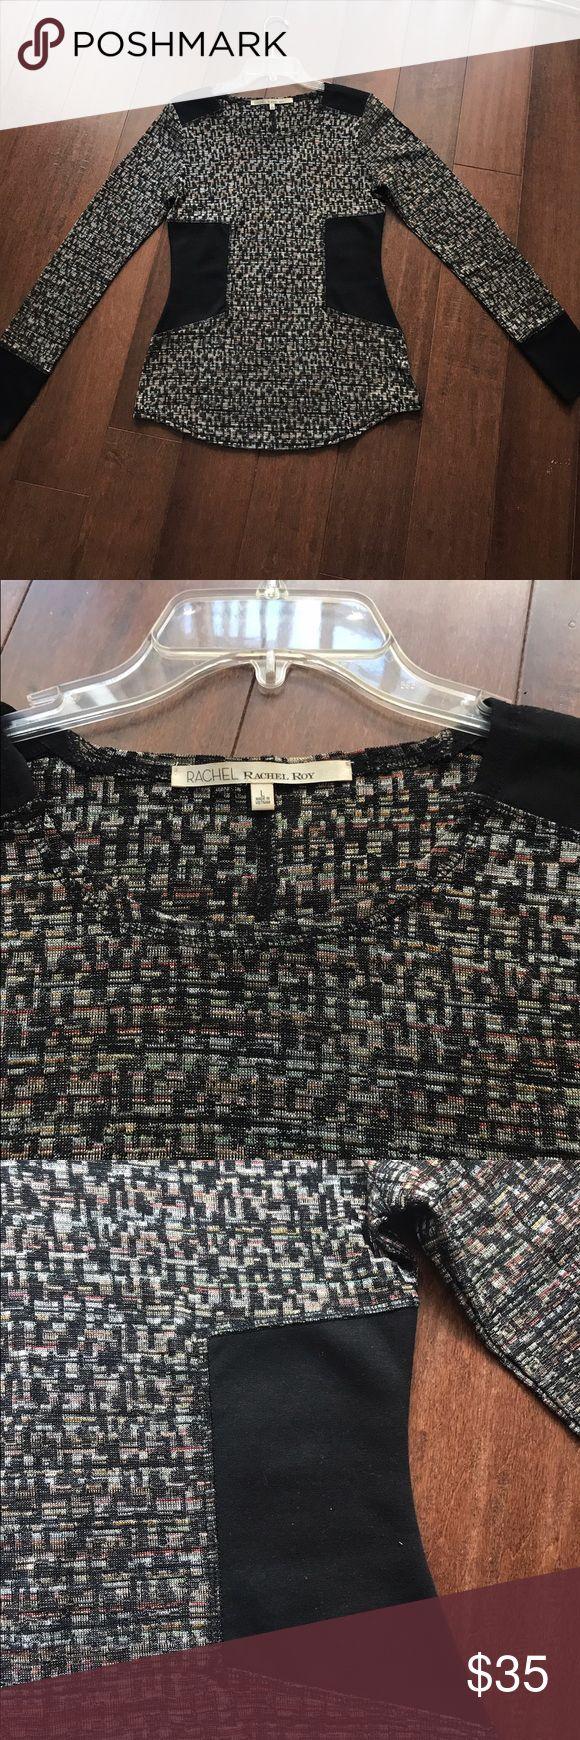 Rachel Roy fitted multi-colored top Rachel Roy fitted multi-colored top. Has a patch of black on both sides which is slimming. RACHEL Rachel Roy Tops